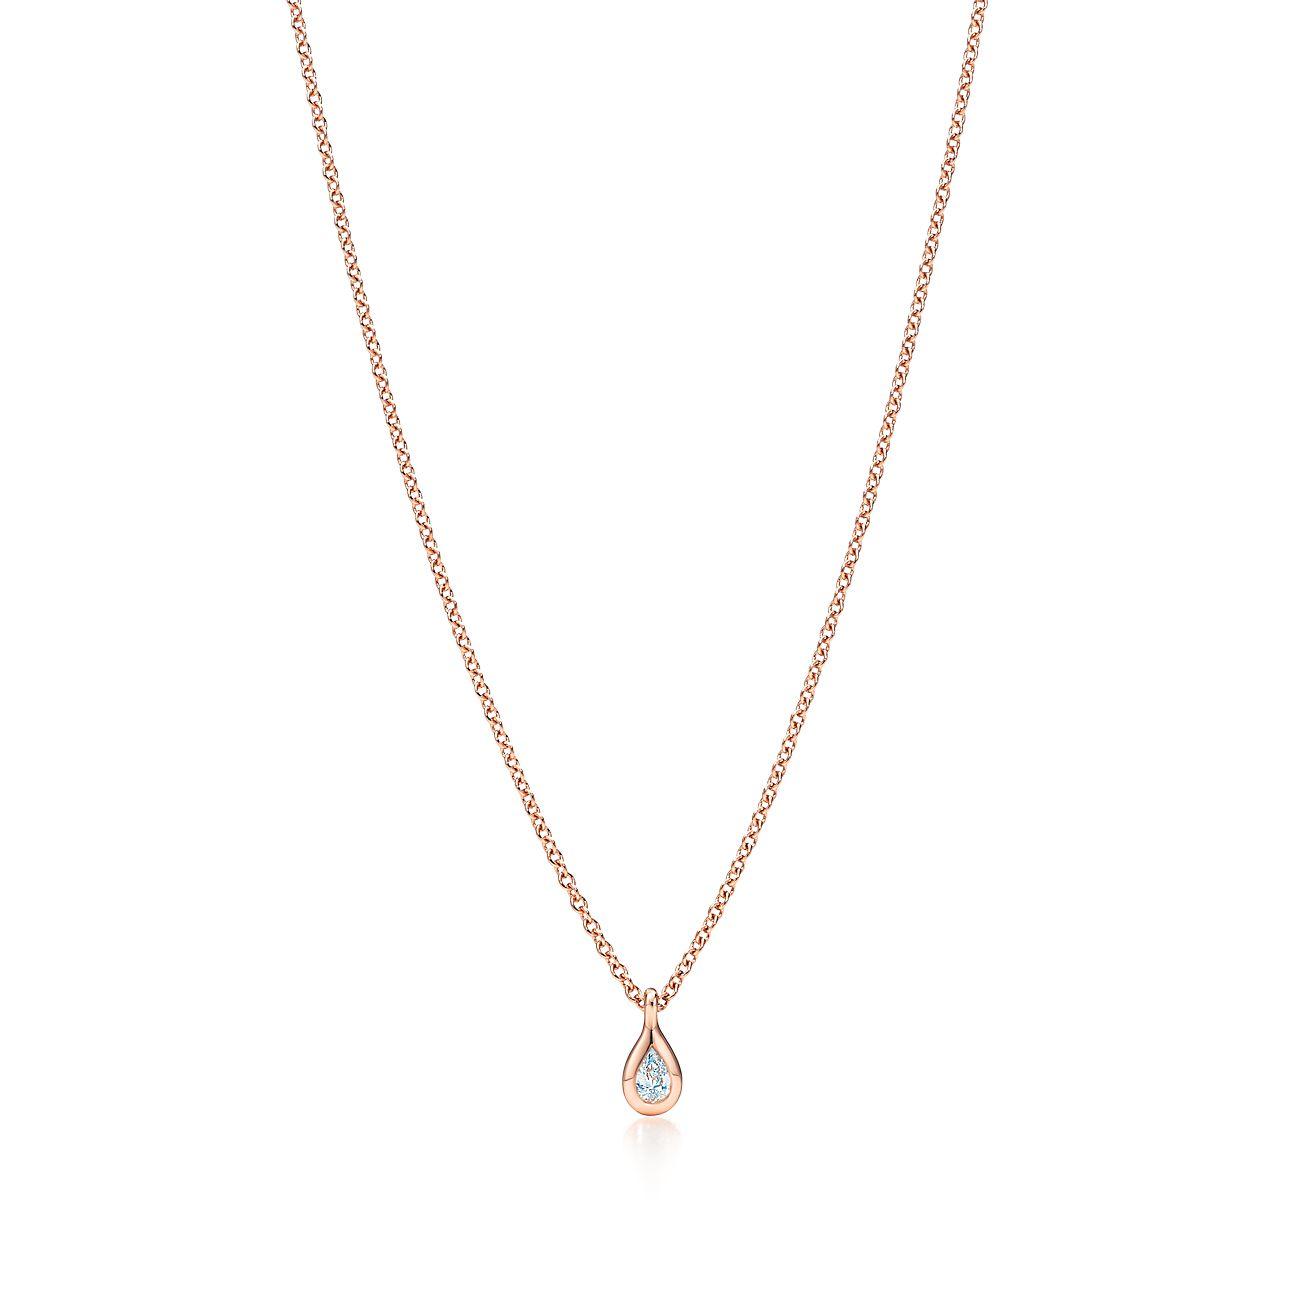 Elsa Peretti Diamantes Por El Colgante Yardas En 18 Quilate - Size.07 Tiffany & Co. msgJ0